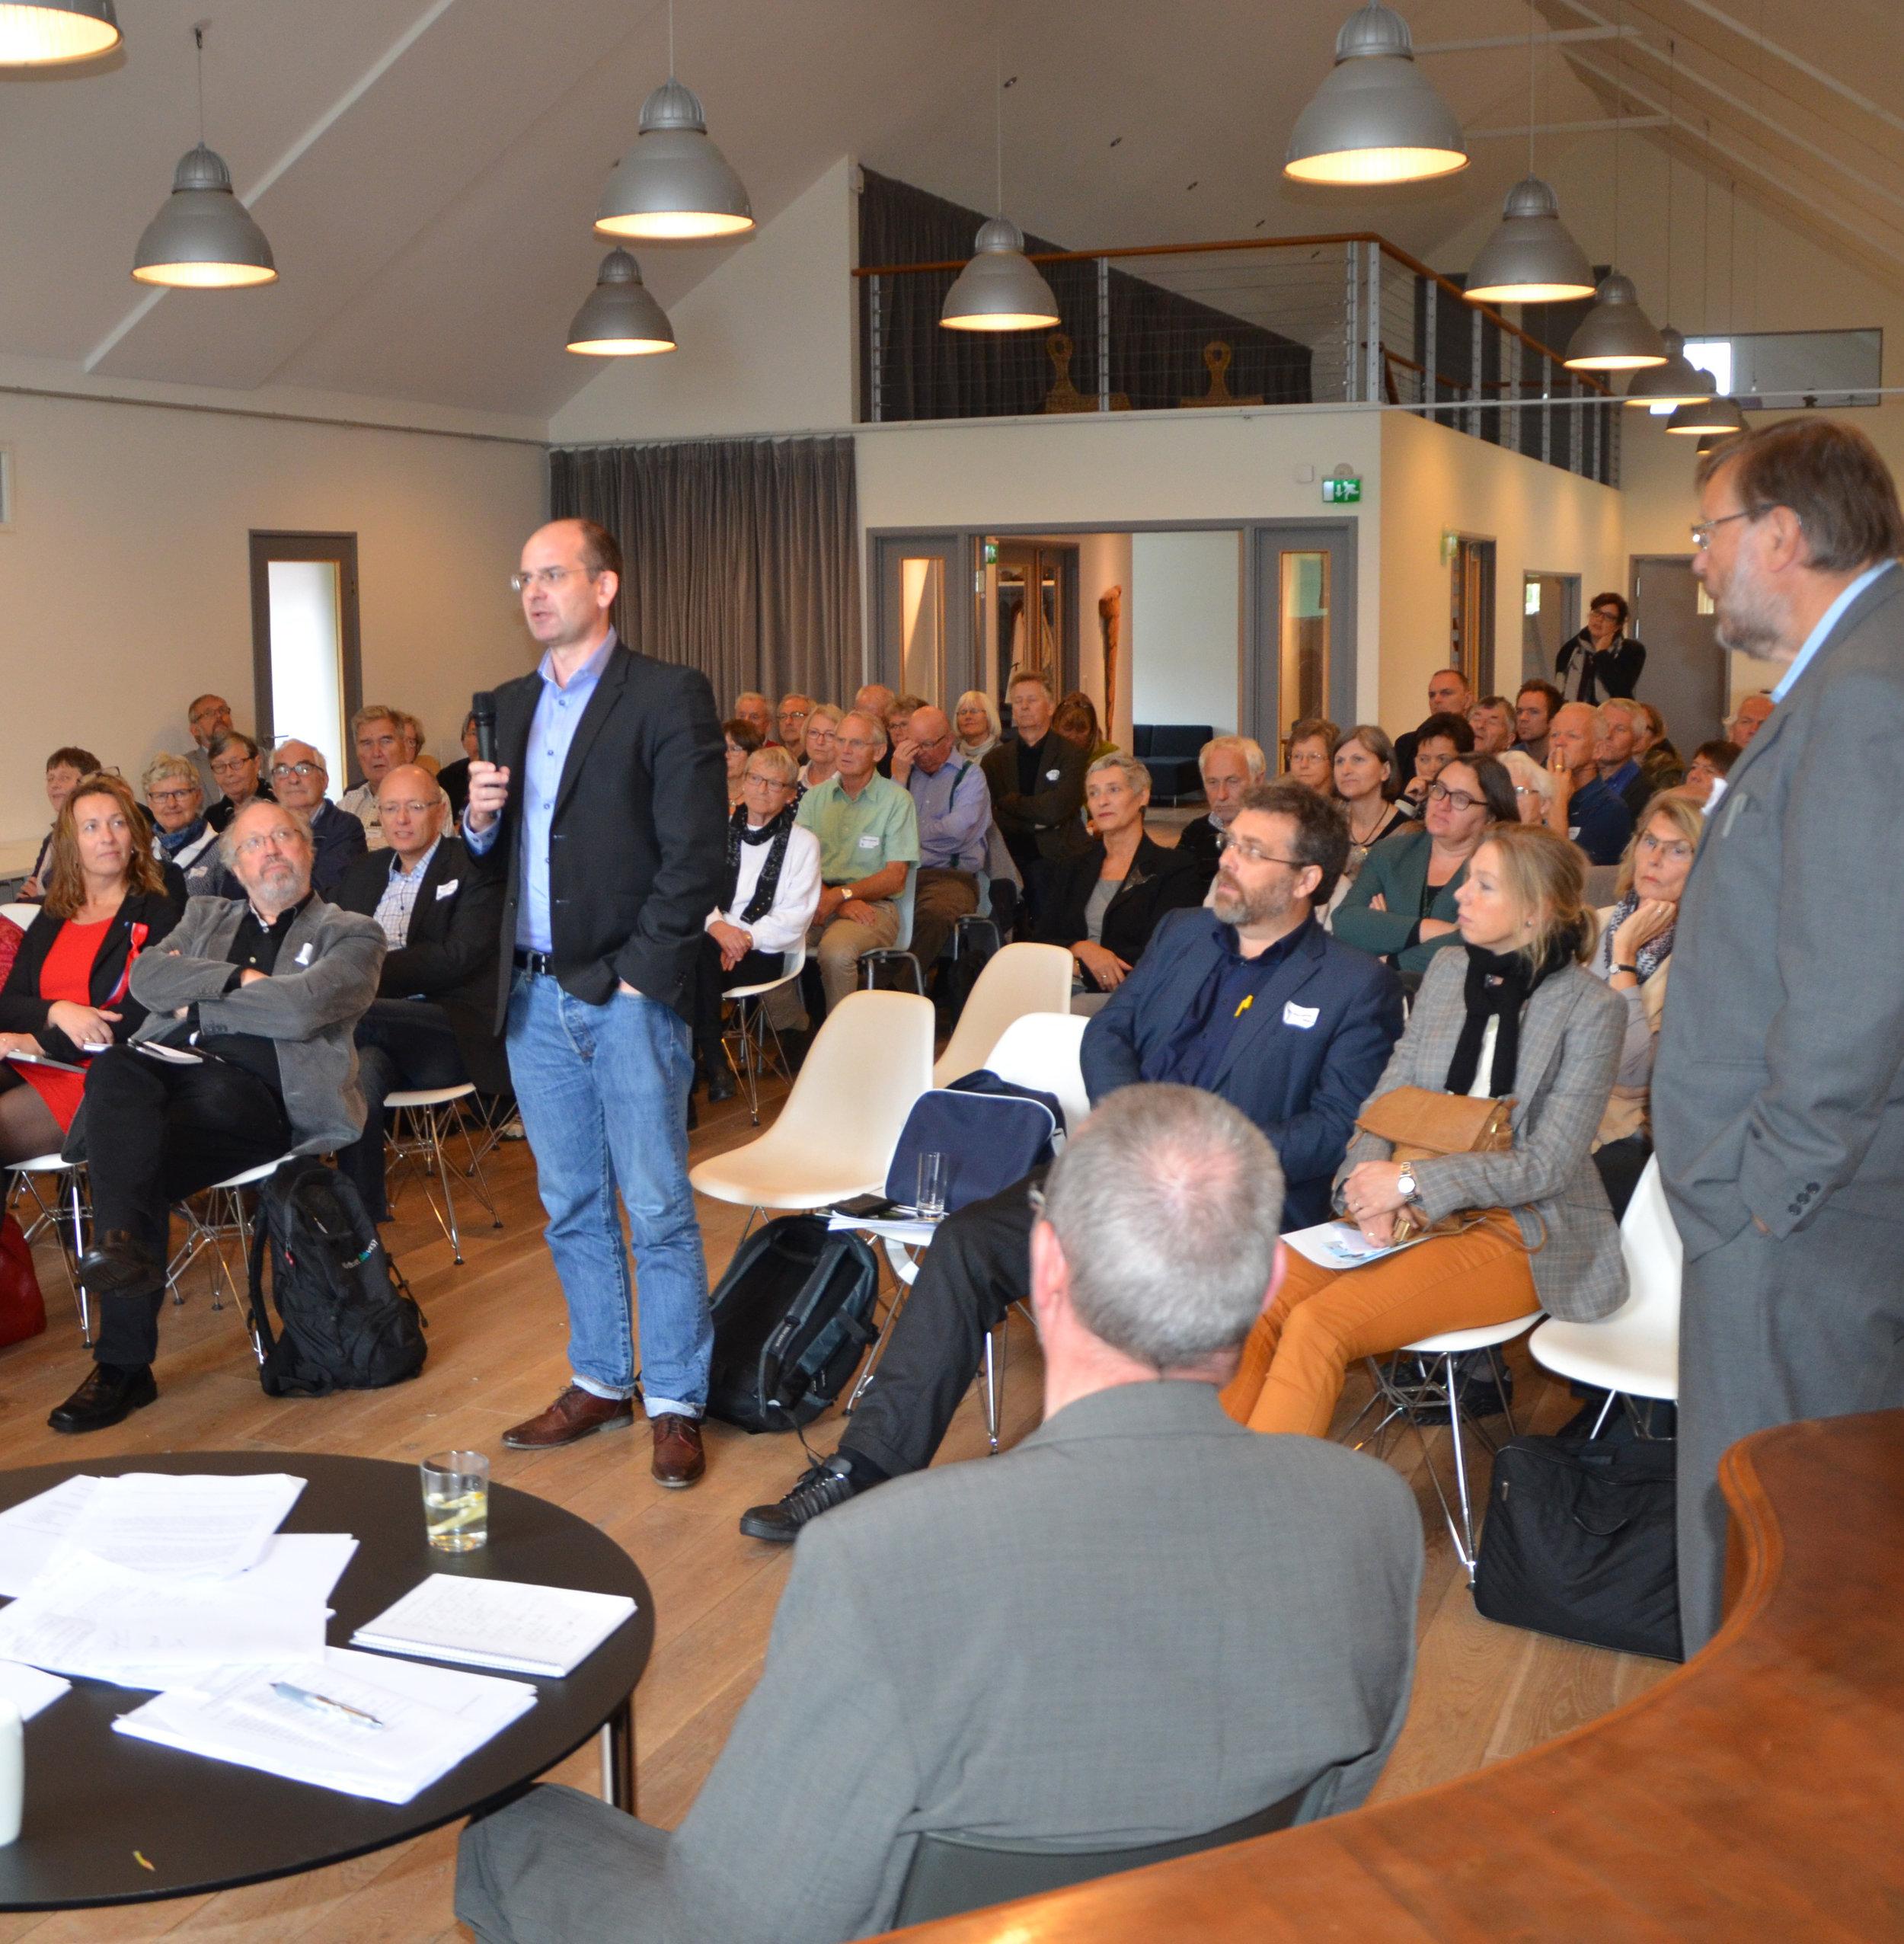 Konferanse på Kulturbruket på Bru.jpg